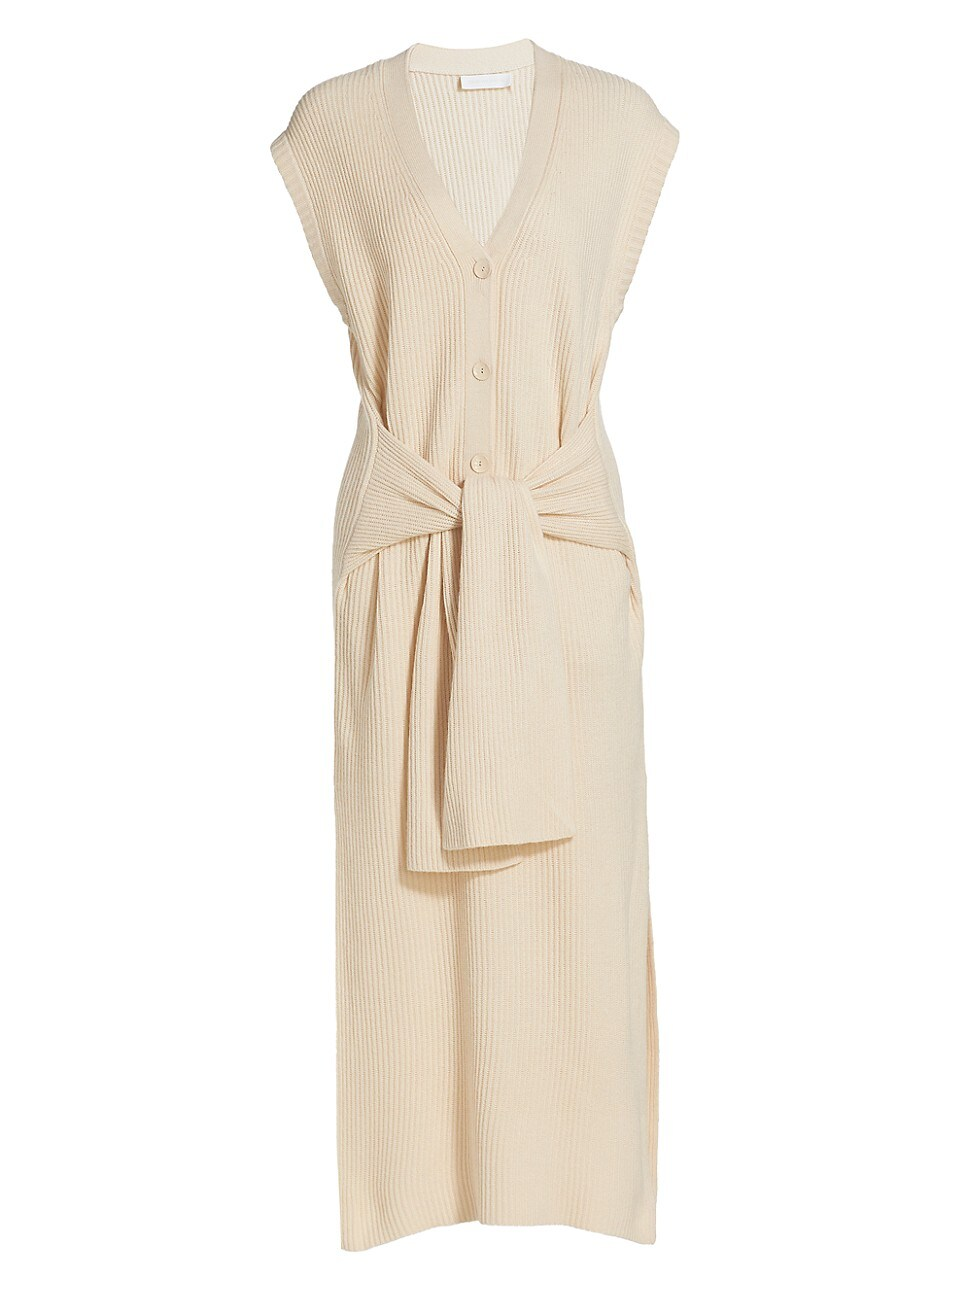 Jonathan Simkhai WOMEN'S ANNETTE RIB-KNIT TIE-WAIST HENLEY DRESS